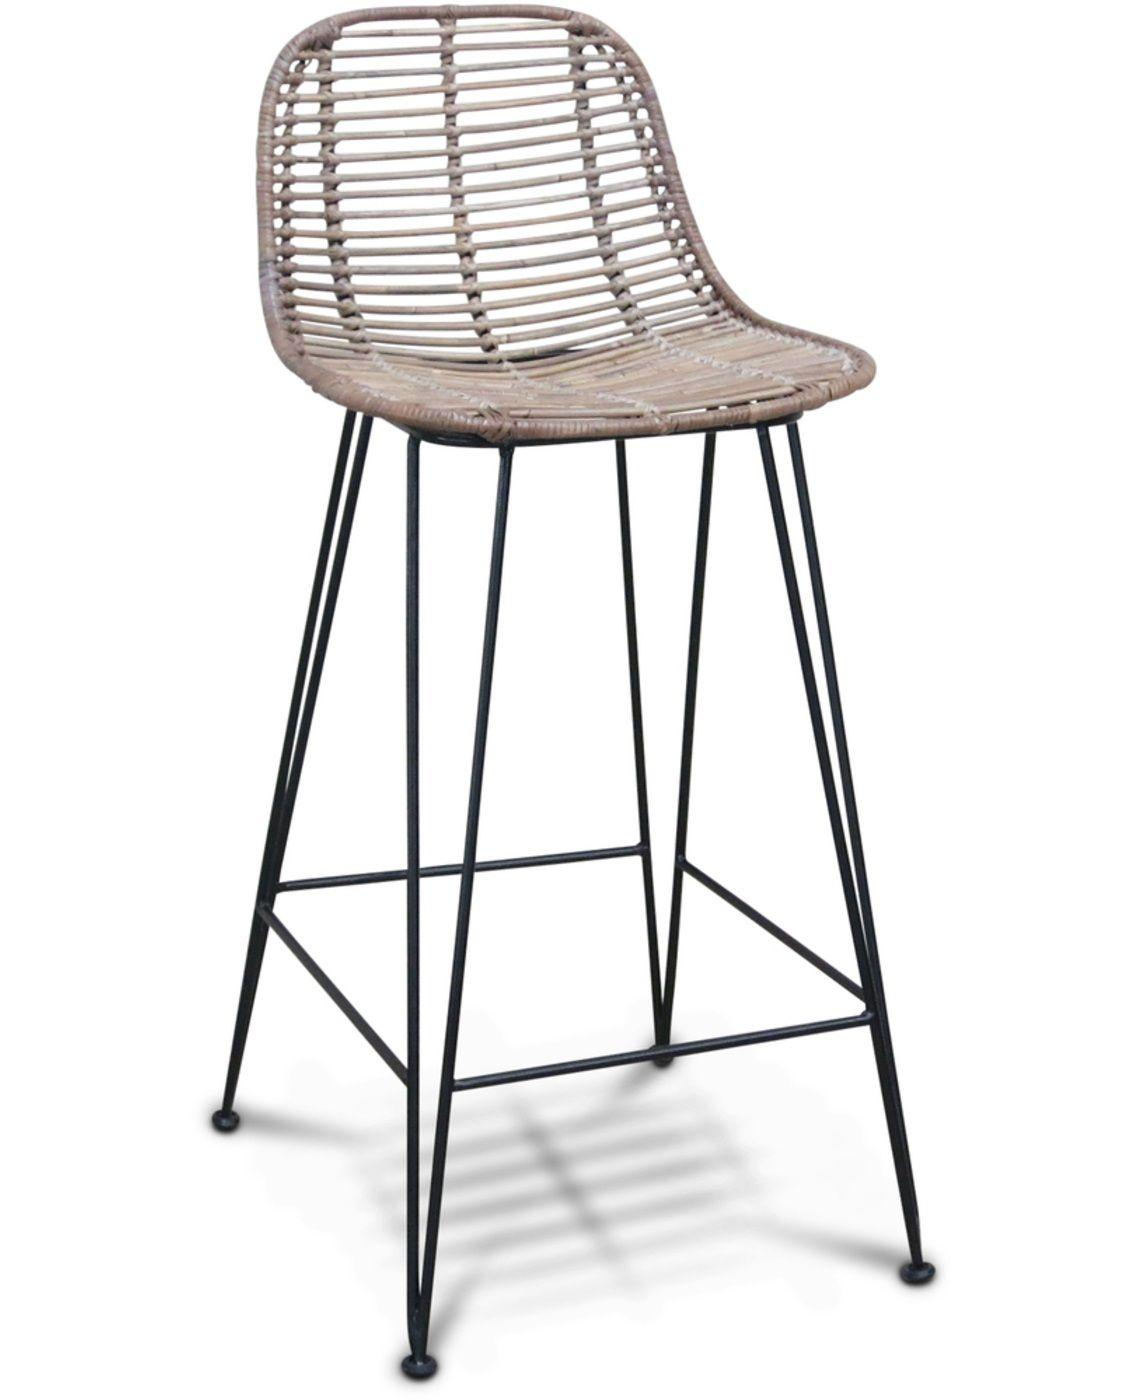 Wondrous An Urban Coastal Style Barstool Also Available In A Chair Machost Co Dining Chair Design Ideas Machostcouk